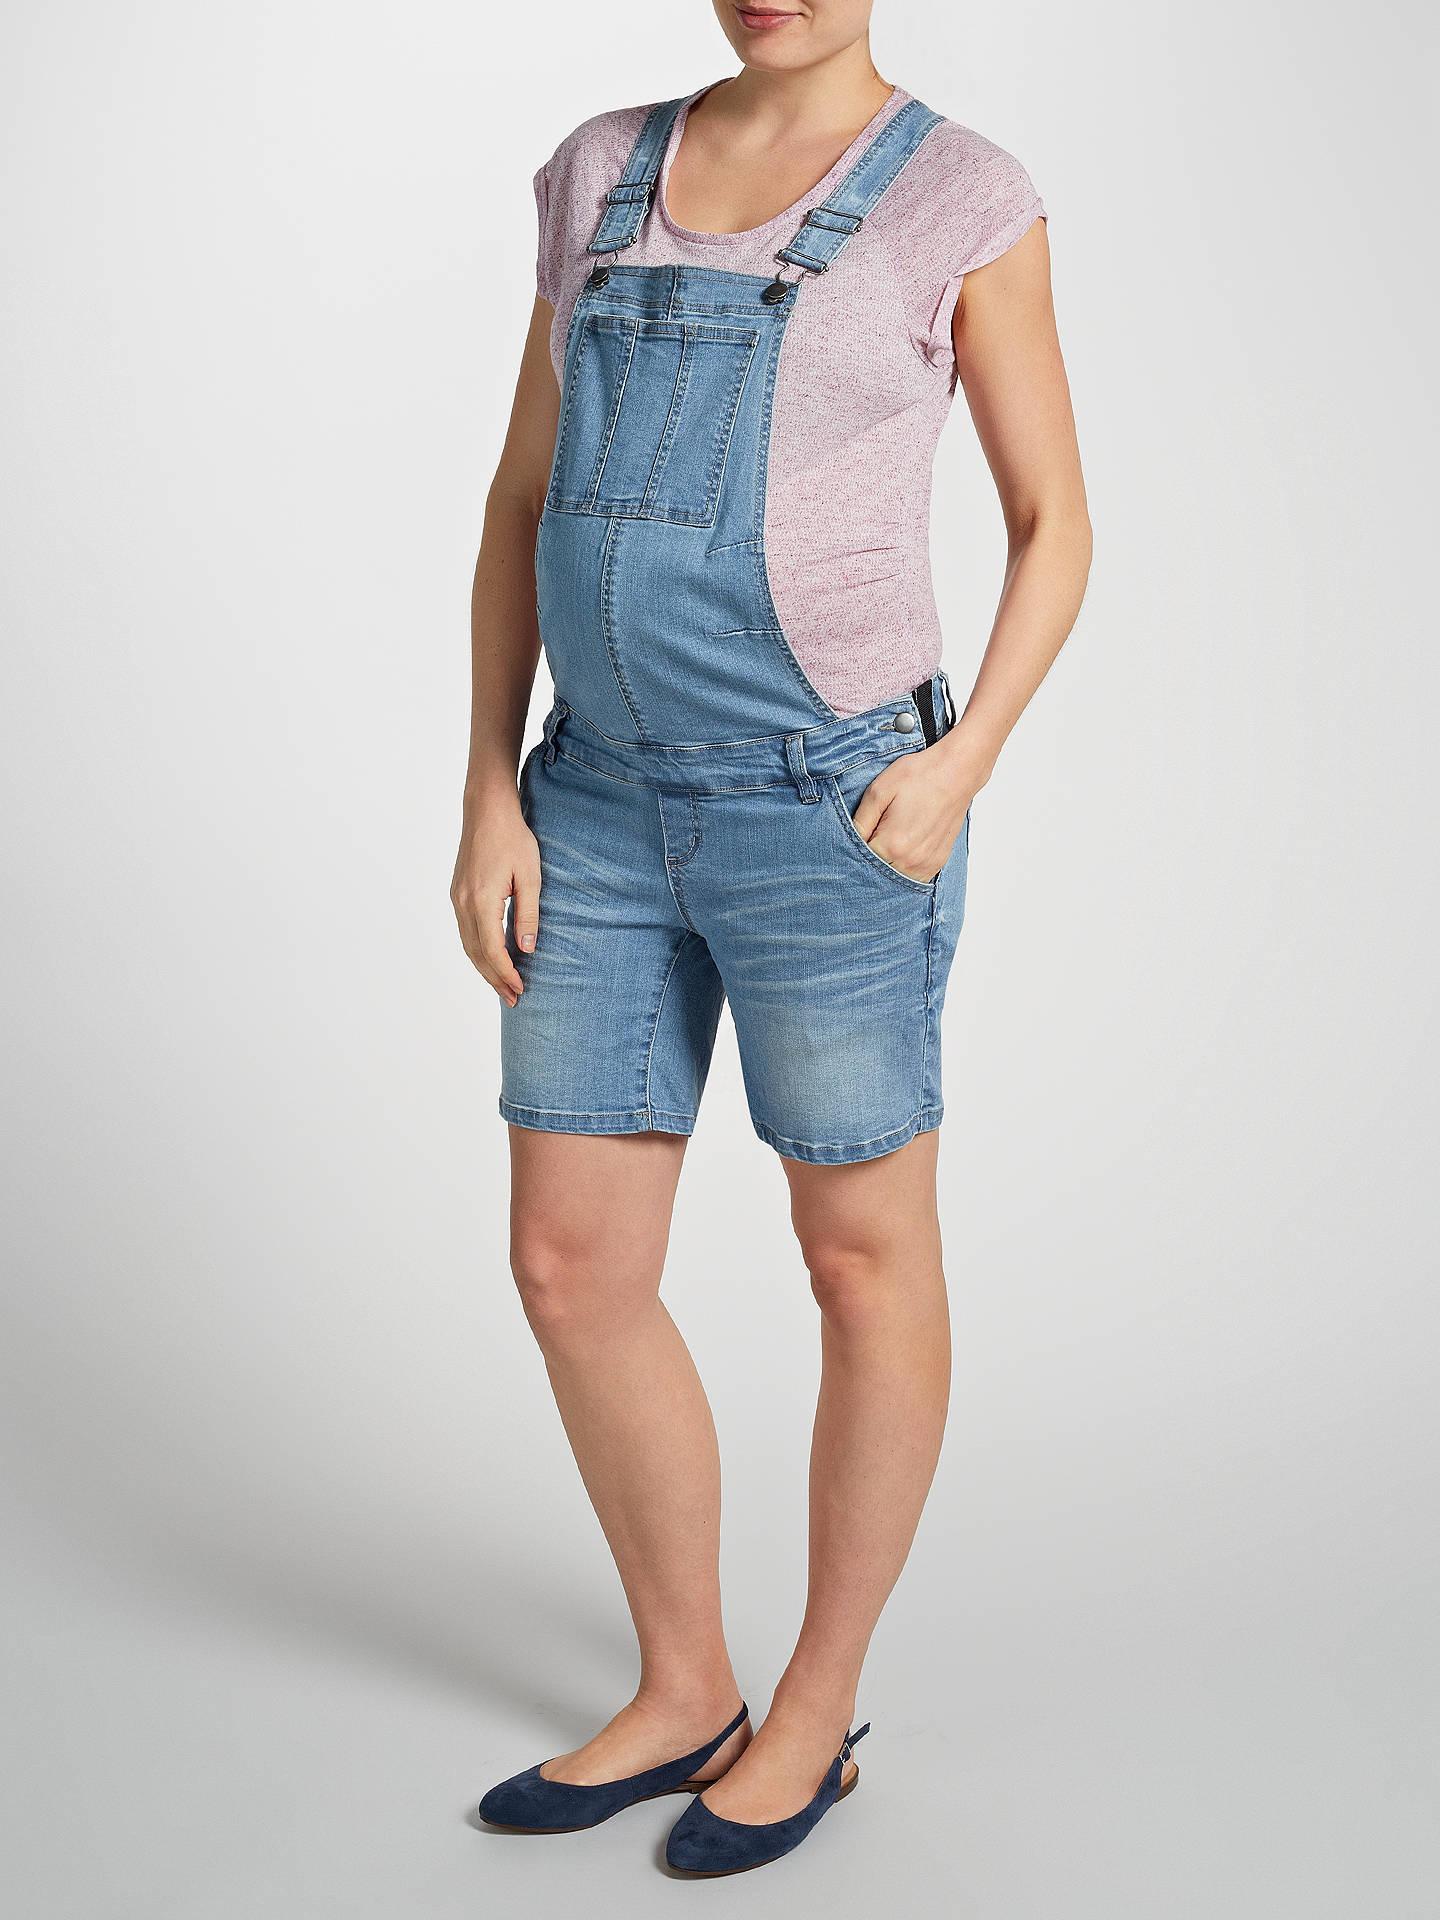 1c33c985aa8d3 ... Buy Mamalicious Alice Dungaree Maternity Shorts, Denim Blue, 26R Online  at johnlewis.com ...